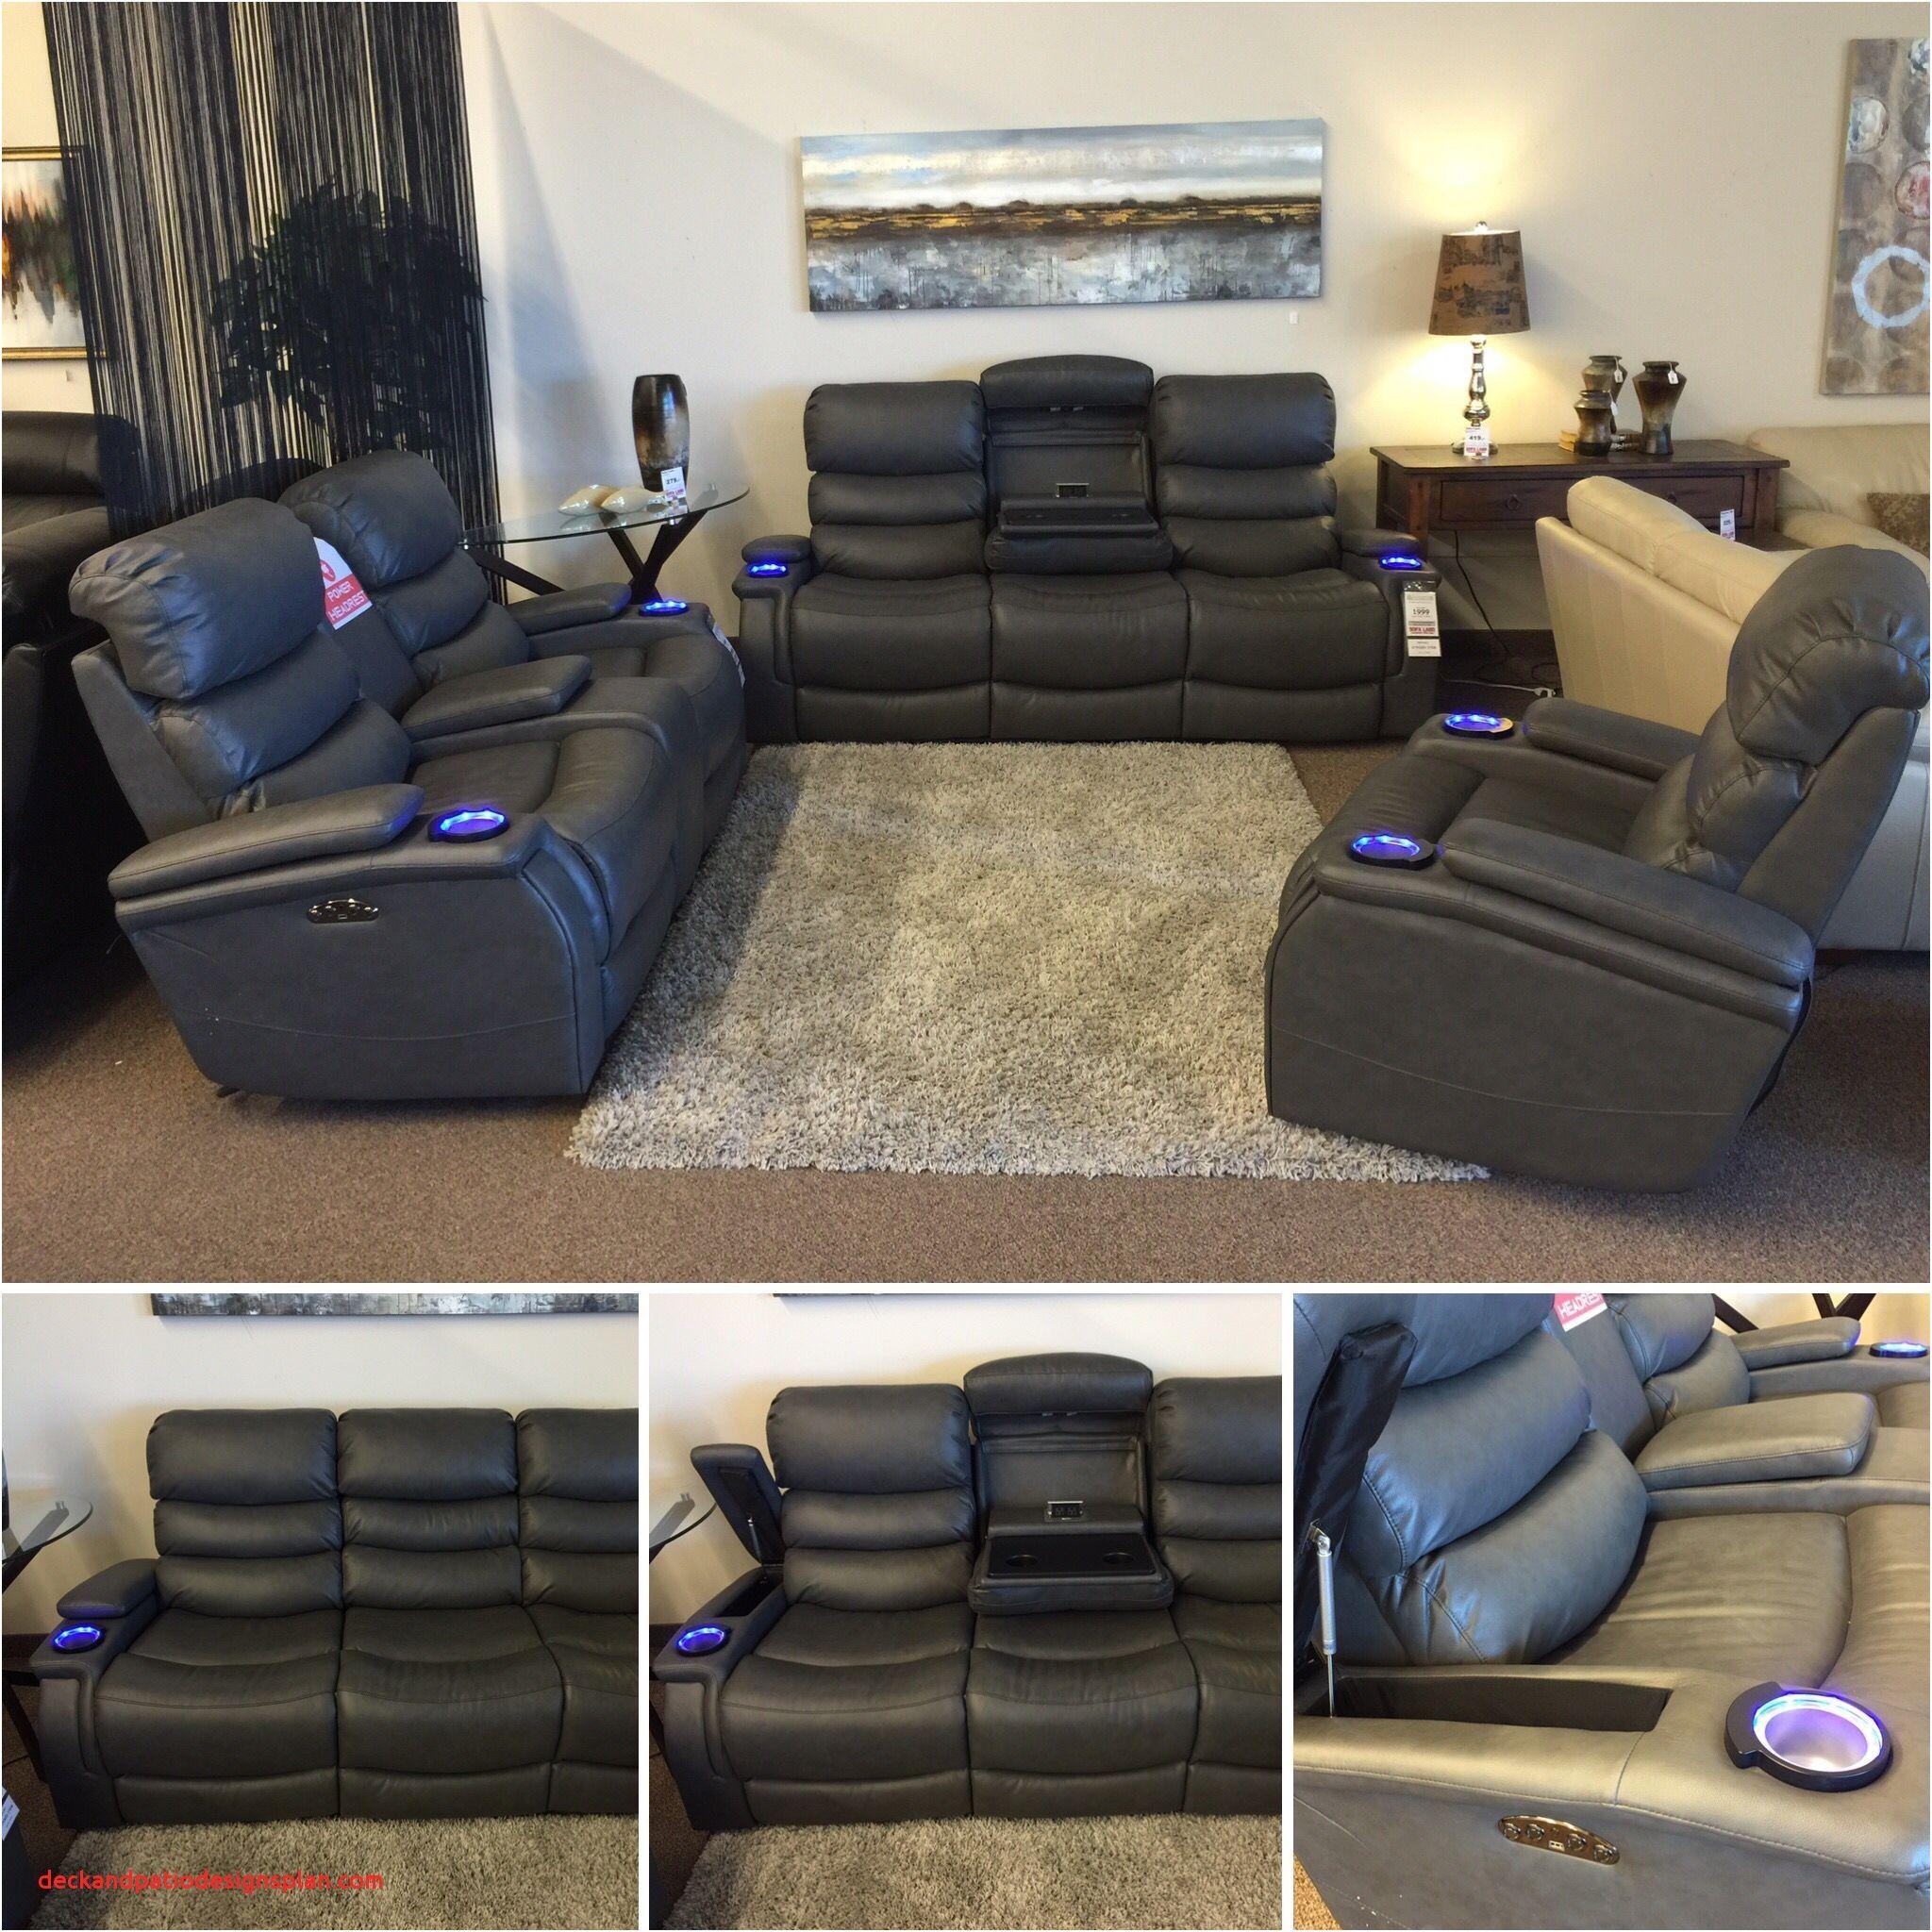 Elegant Xxl Sofa L Form Big Sofa U Form Big Sofa Led This Sofa Is So Awesome Power Recline With Big Sofa Xxl U Form In 2020